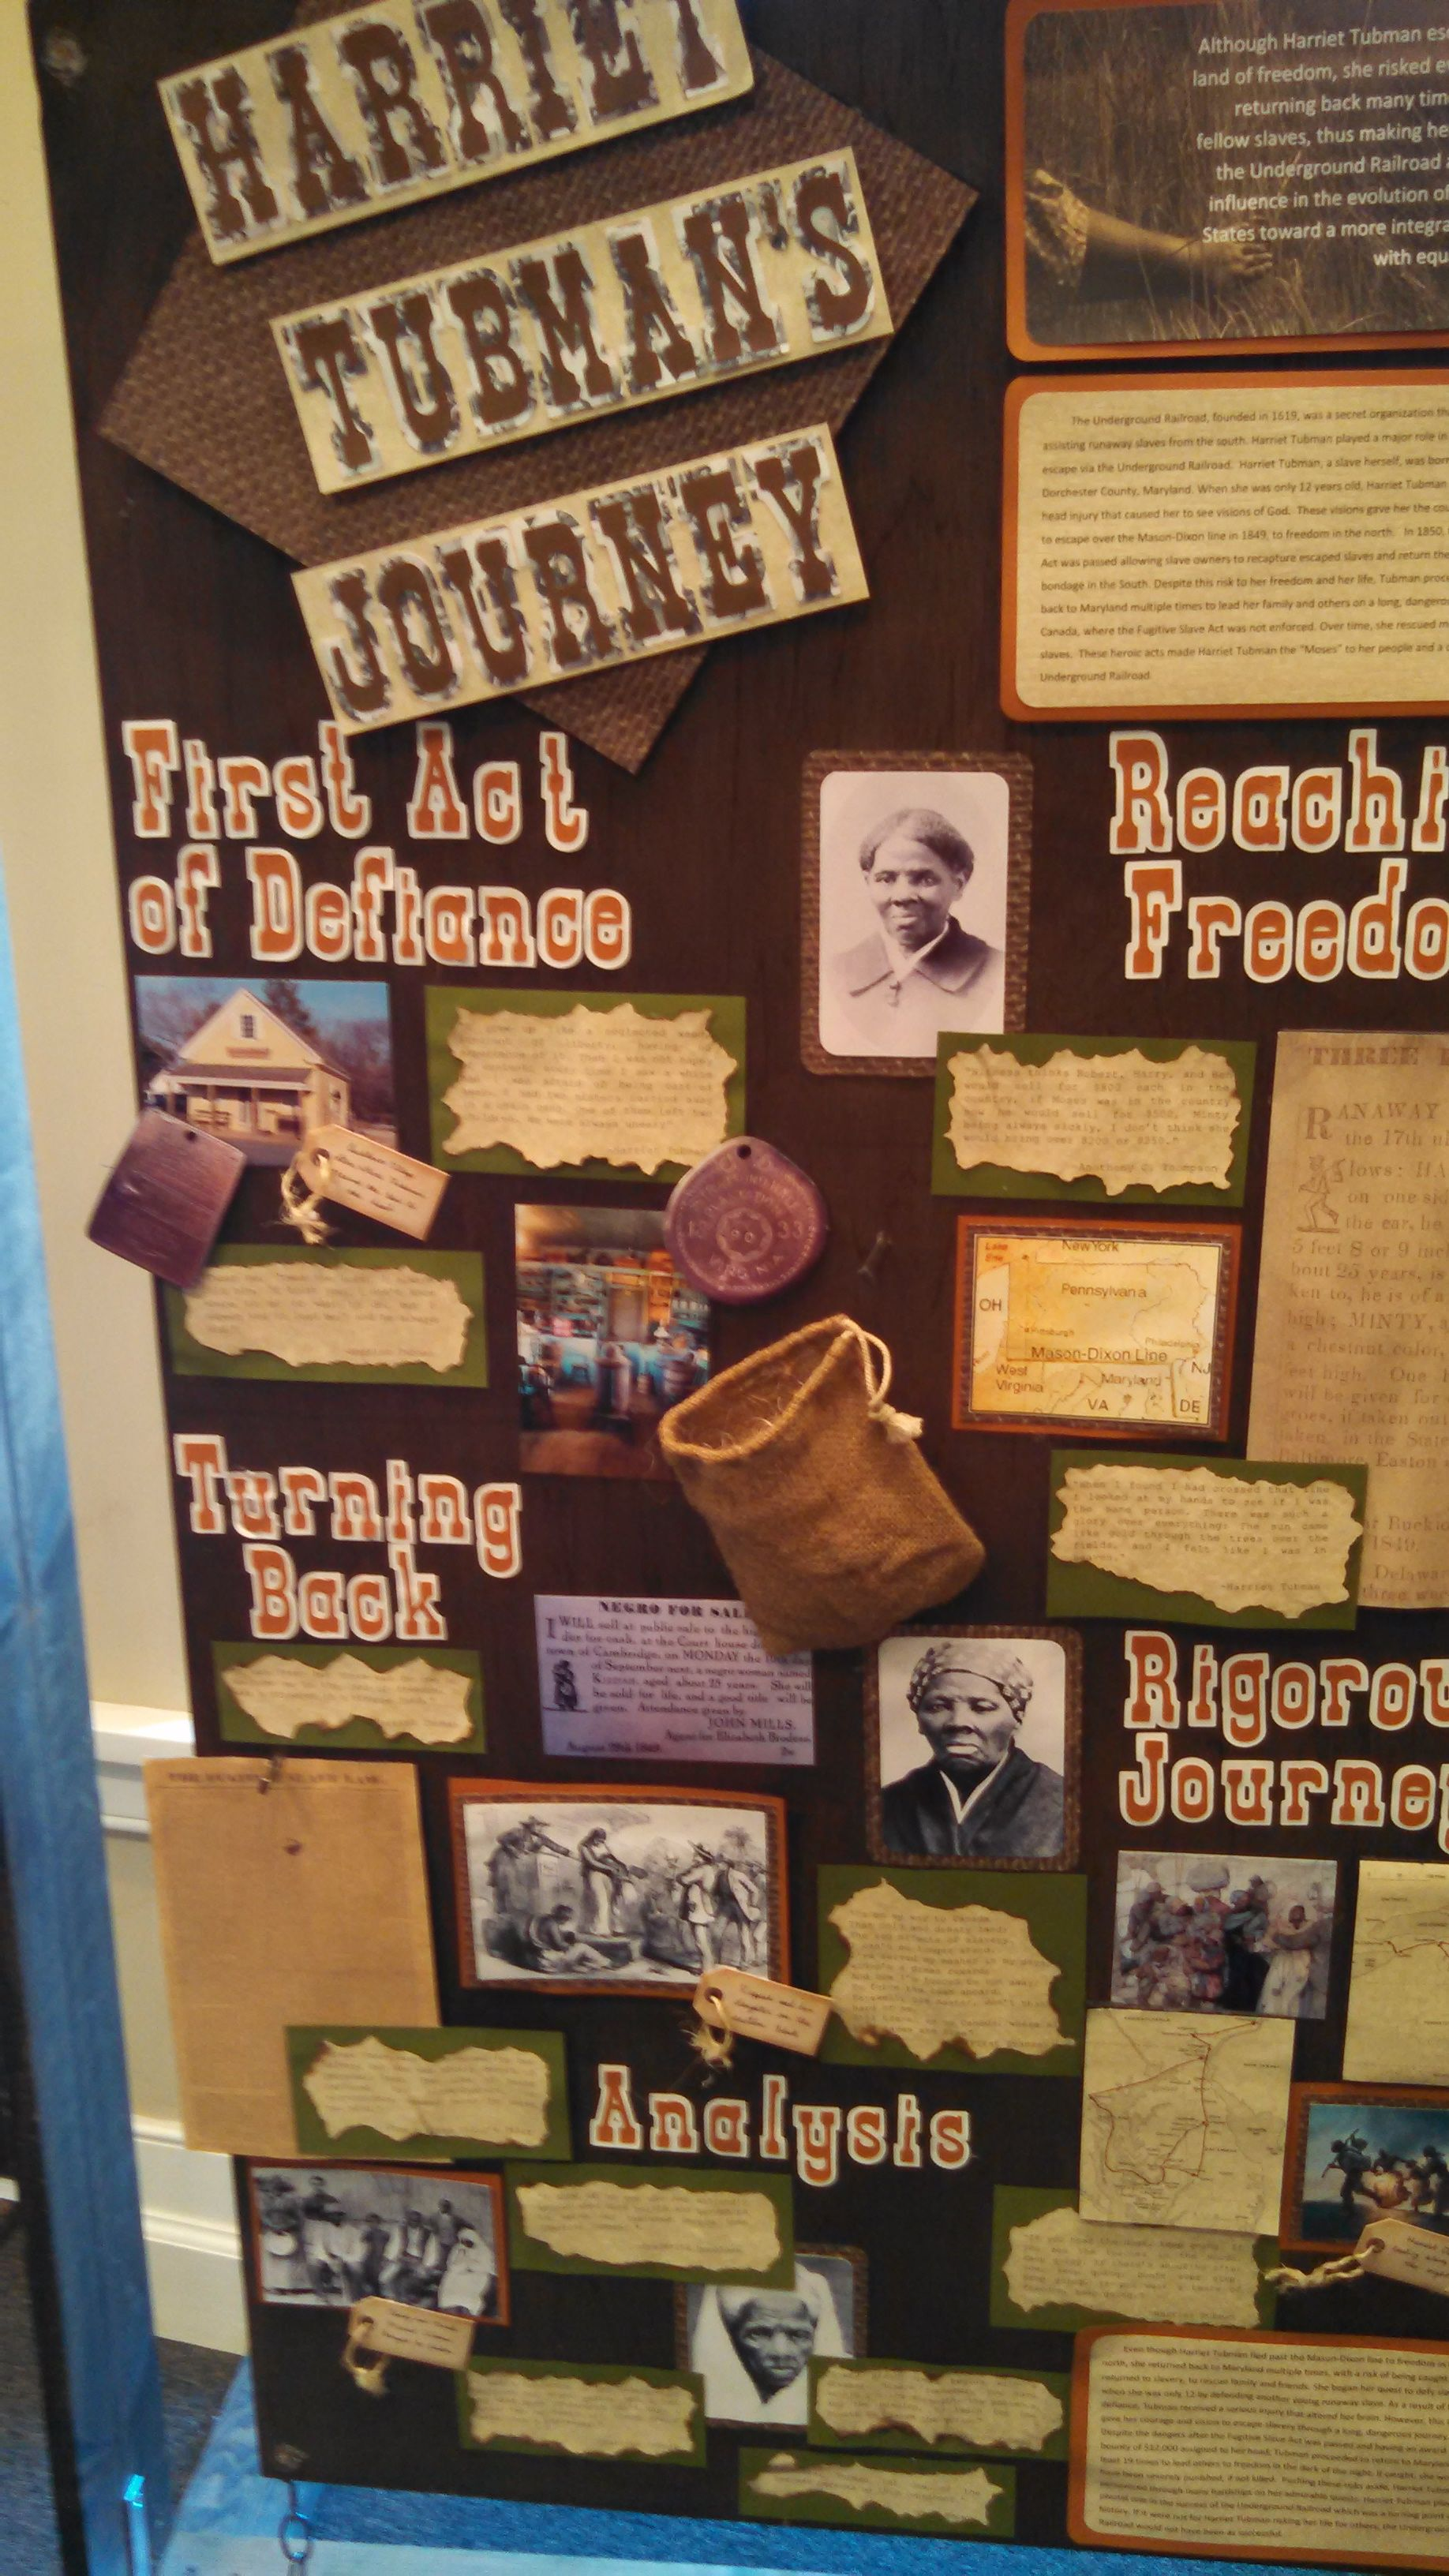 Img 487 Harriet Tubman Museum